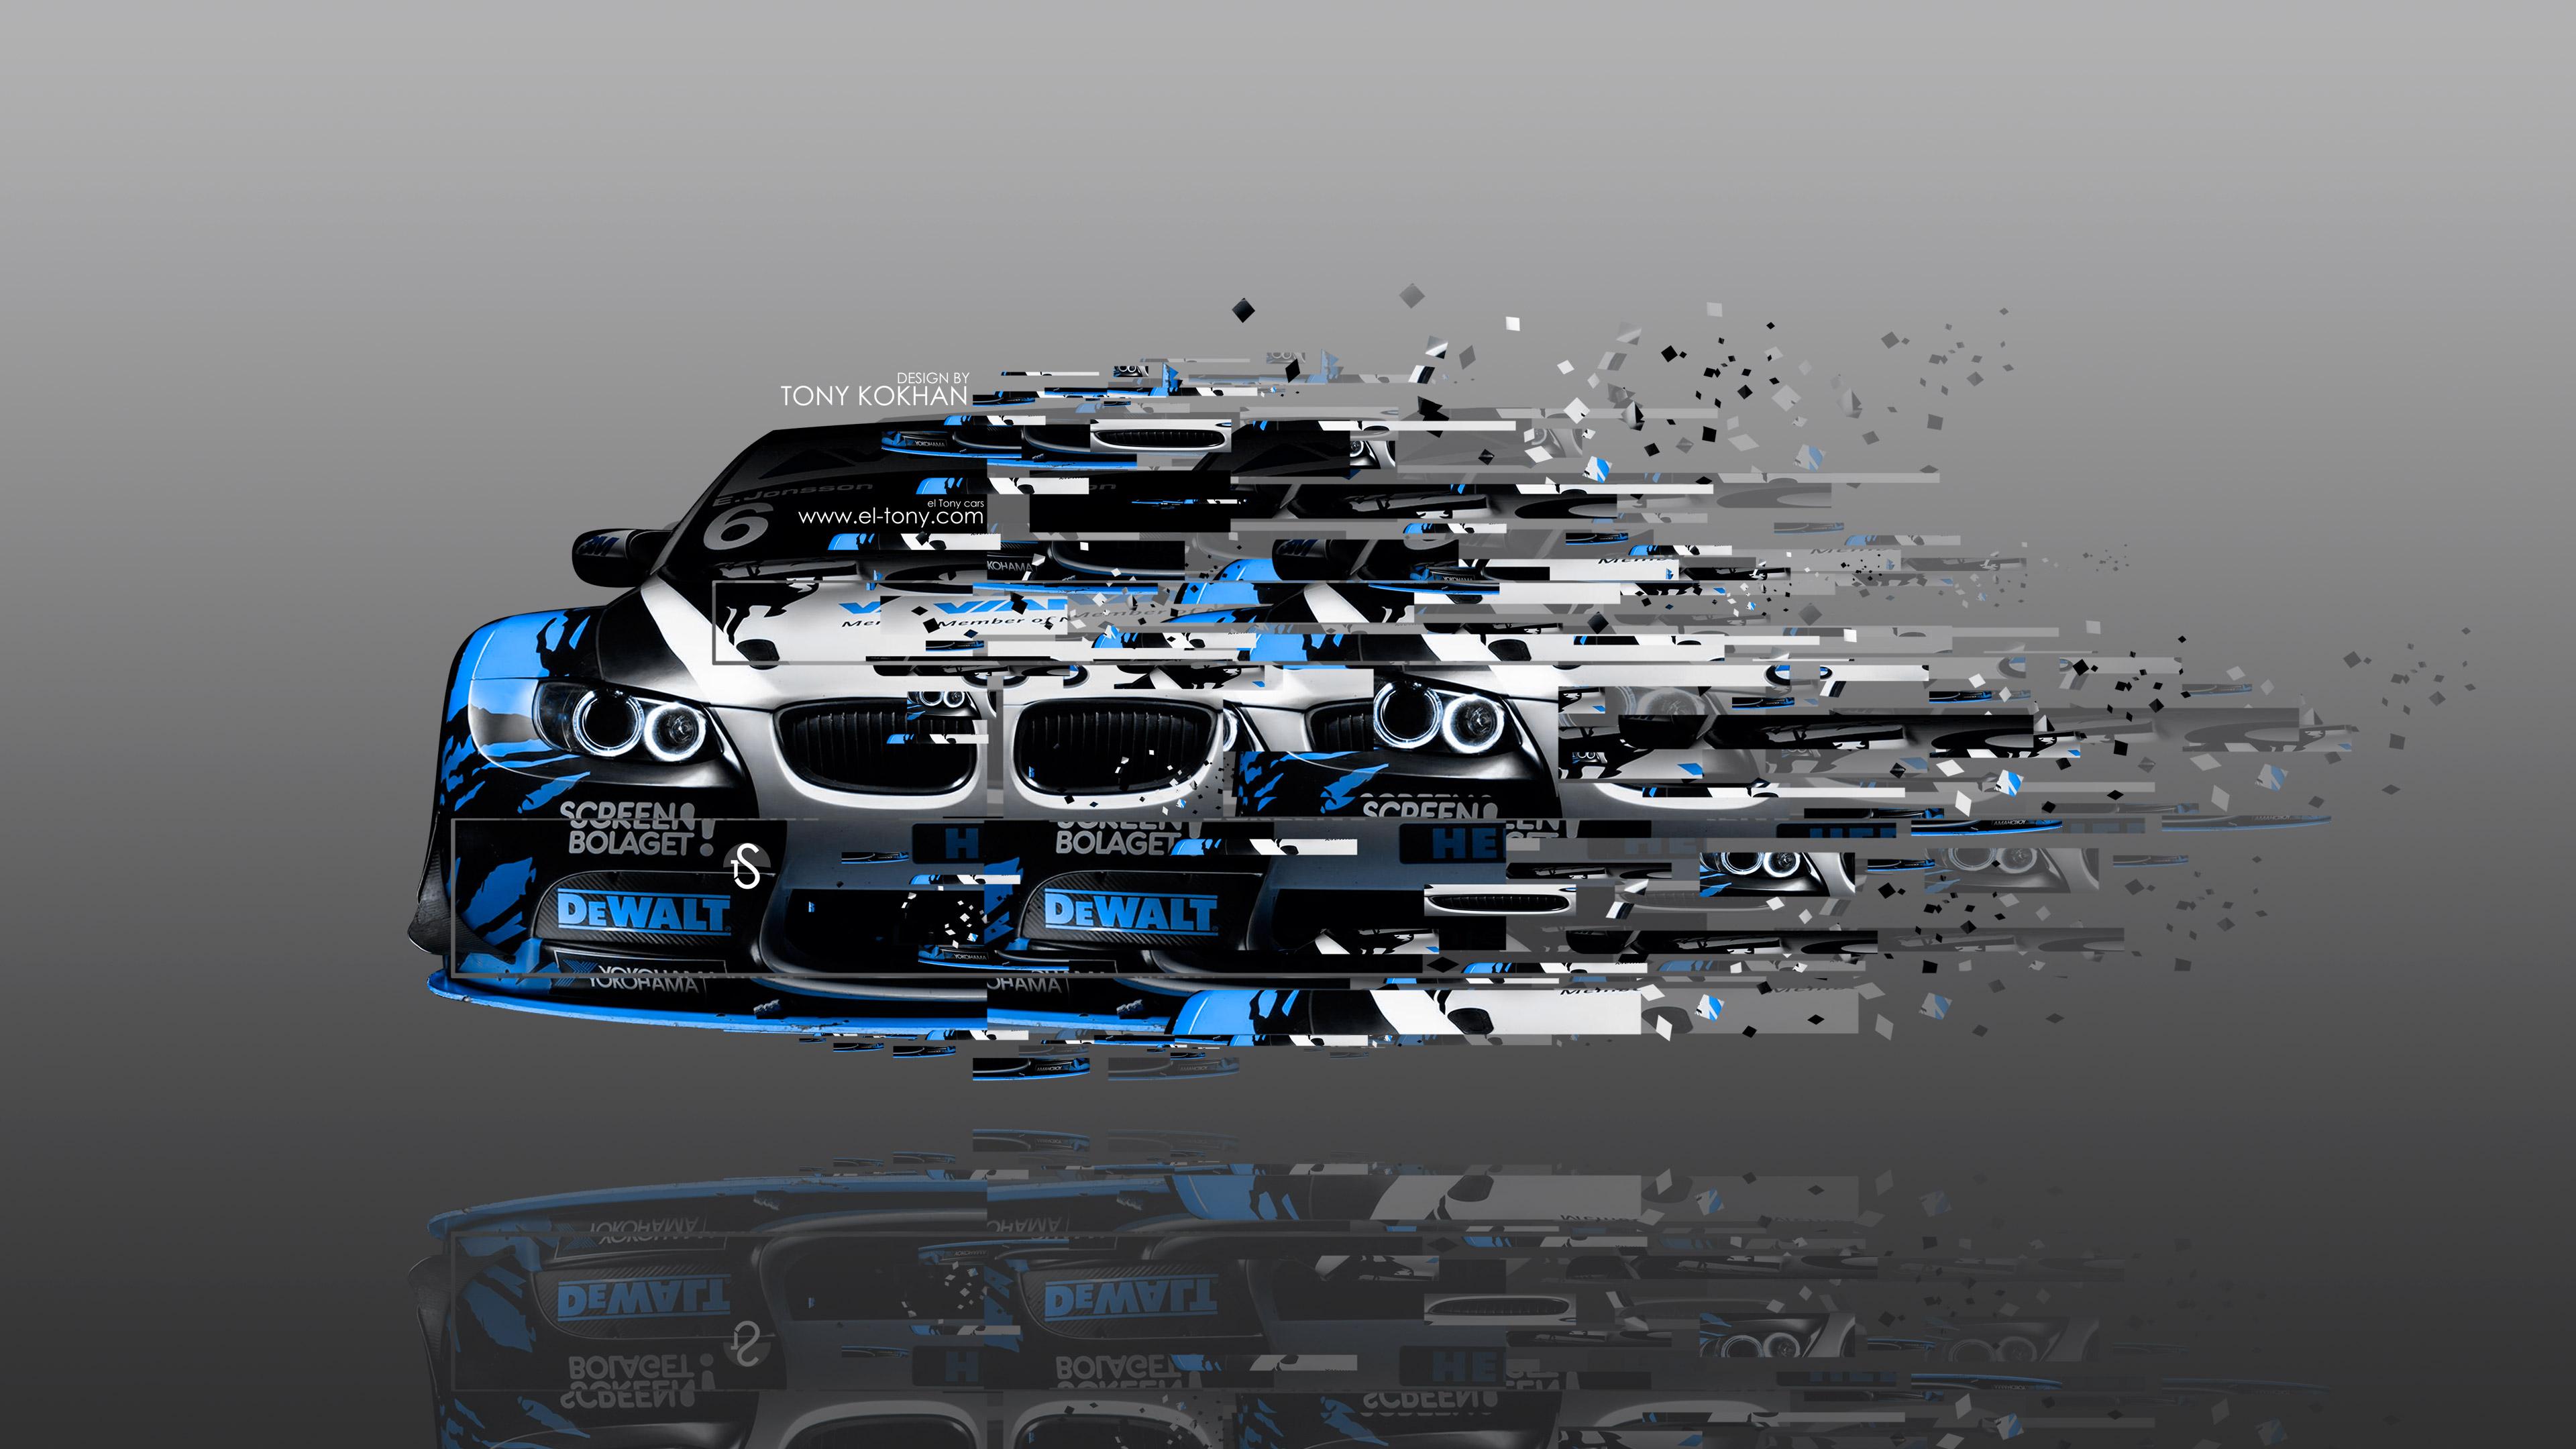 BMW M3 E92 Tuning Front Fantasy Transkinetiks Car  el tonycom 3840x2160